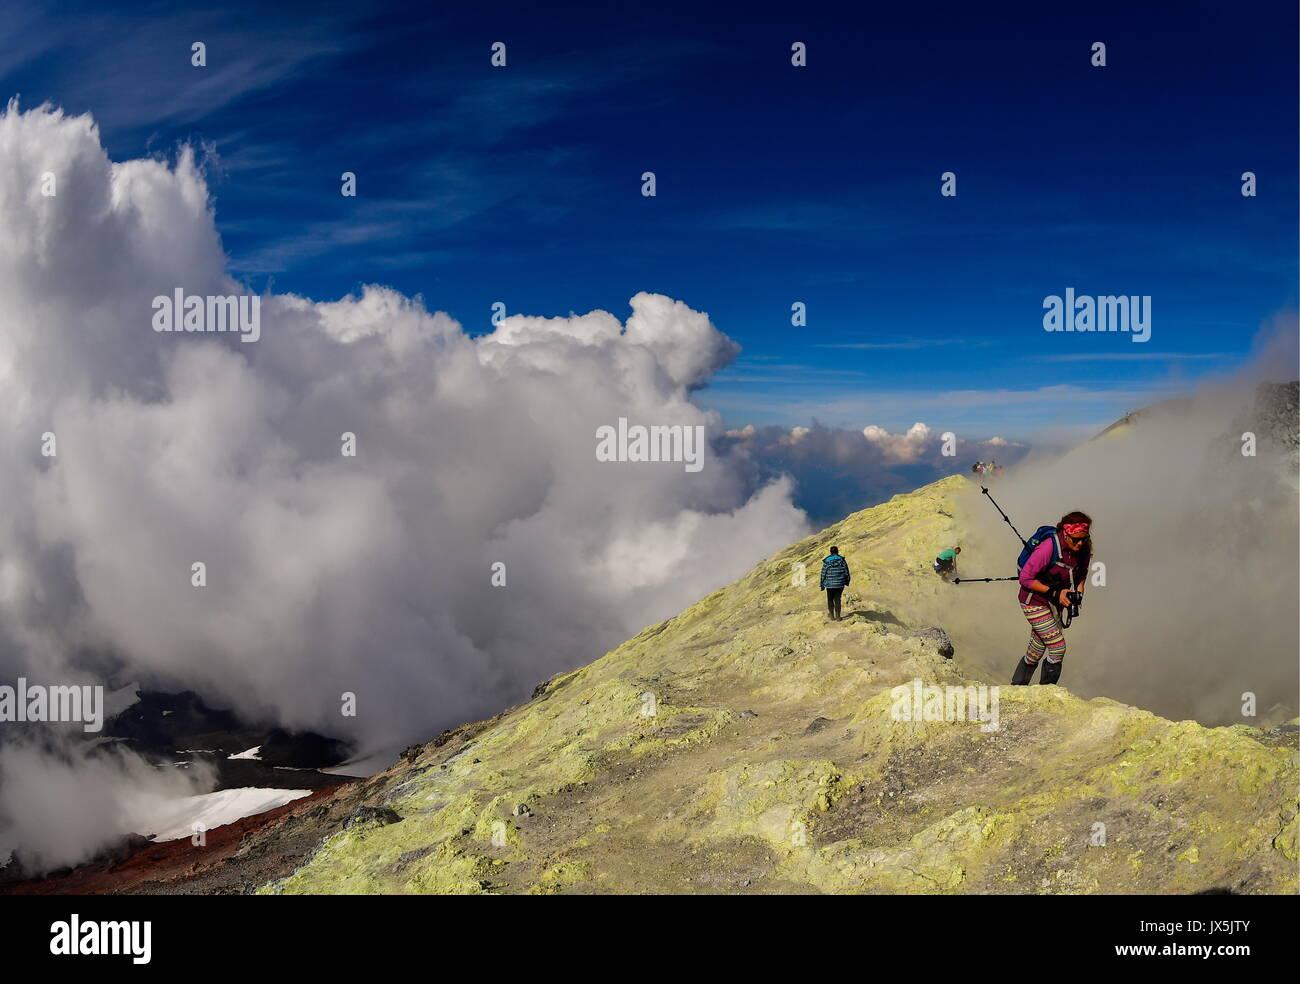 Territorio de Kamchatka (Rusia). 12 Aug, 2017. Los turistas en el cráter de Avachinsky activos Estratovolcán. Crédito: Yuri Smityuk/TASS/Alamy Live News Imagen De Stock